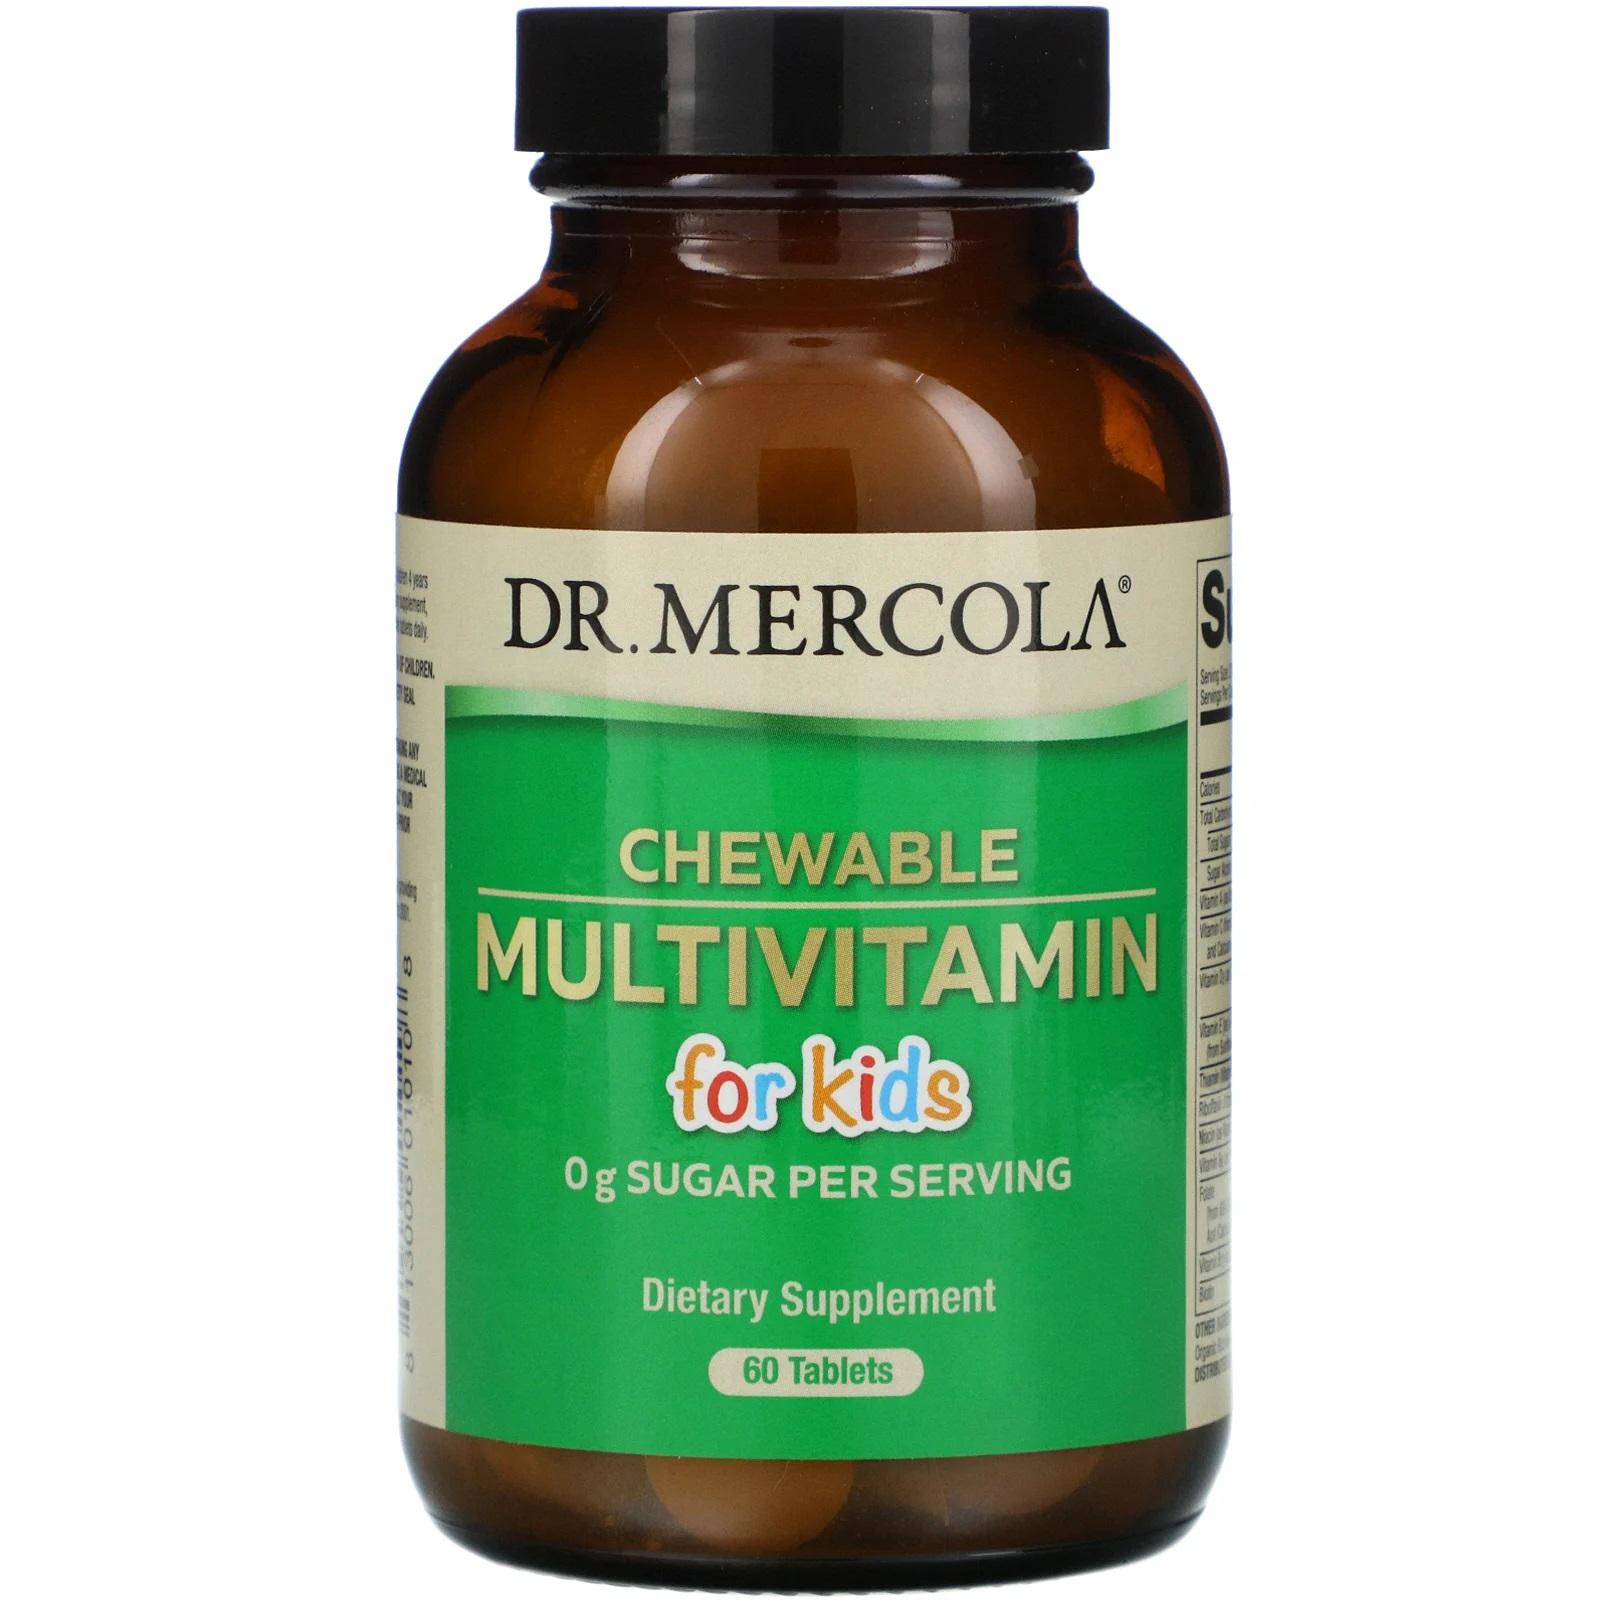 Image of Children's Multivitamin Fruit Flavored Chewables (60 Tablets) - Dr. Mercola 0813006010108